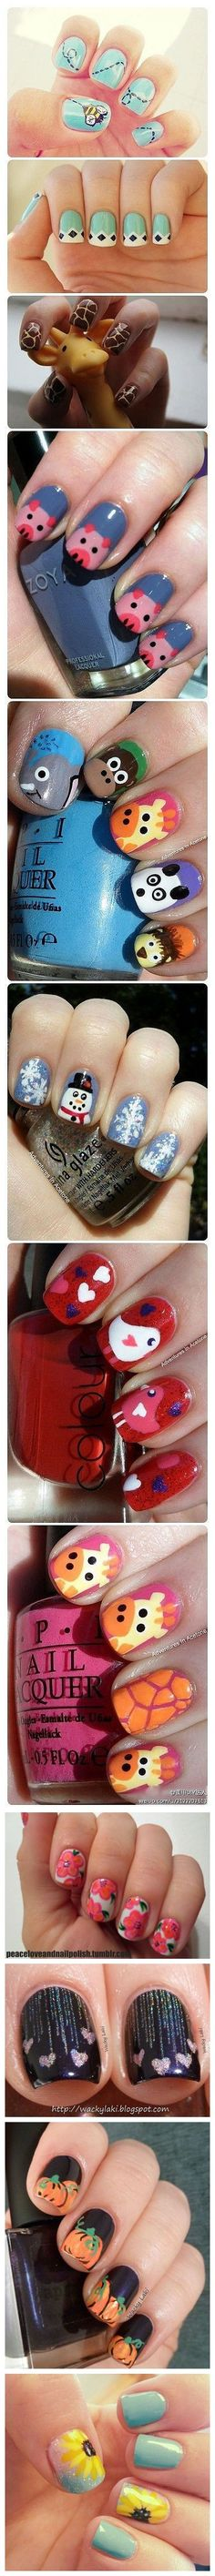 866 best * SIMPLE Nail Art Design Ideas images on Pinterest | Nail ...